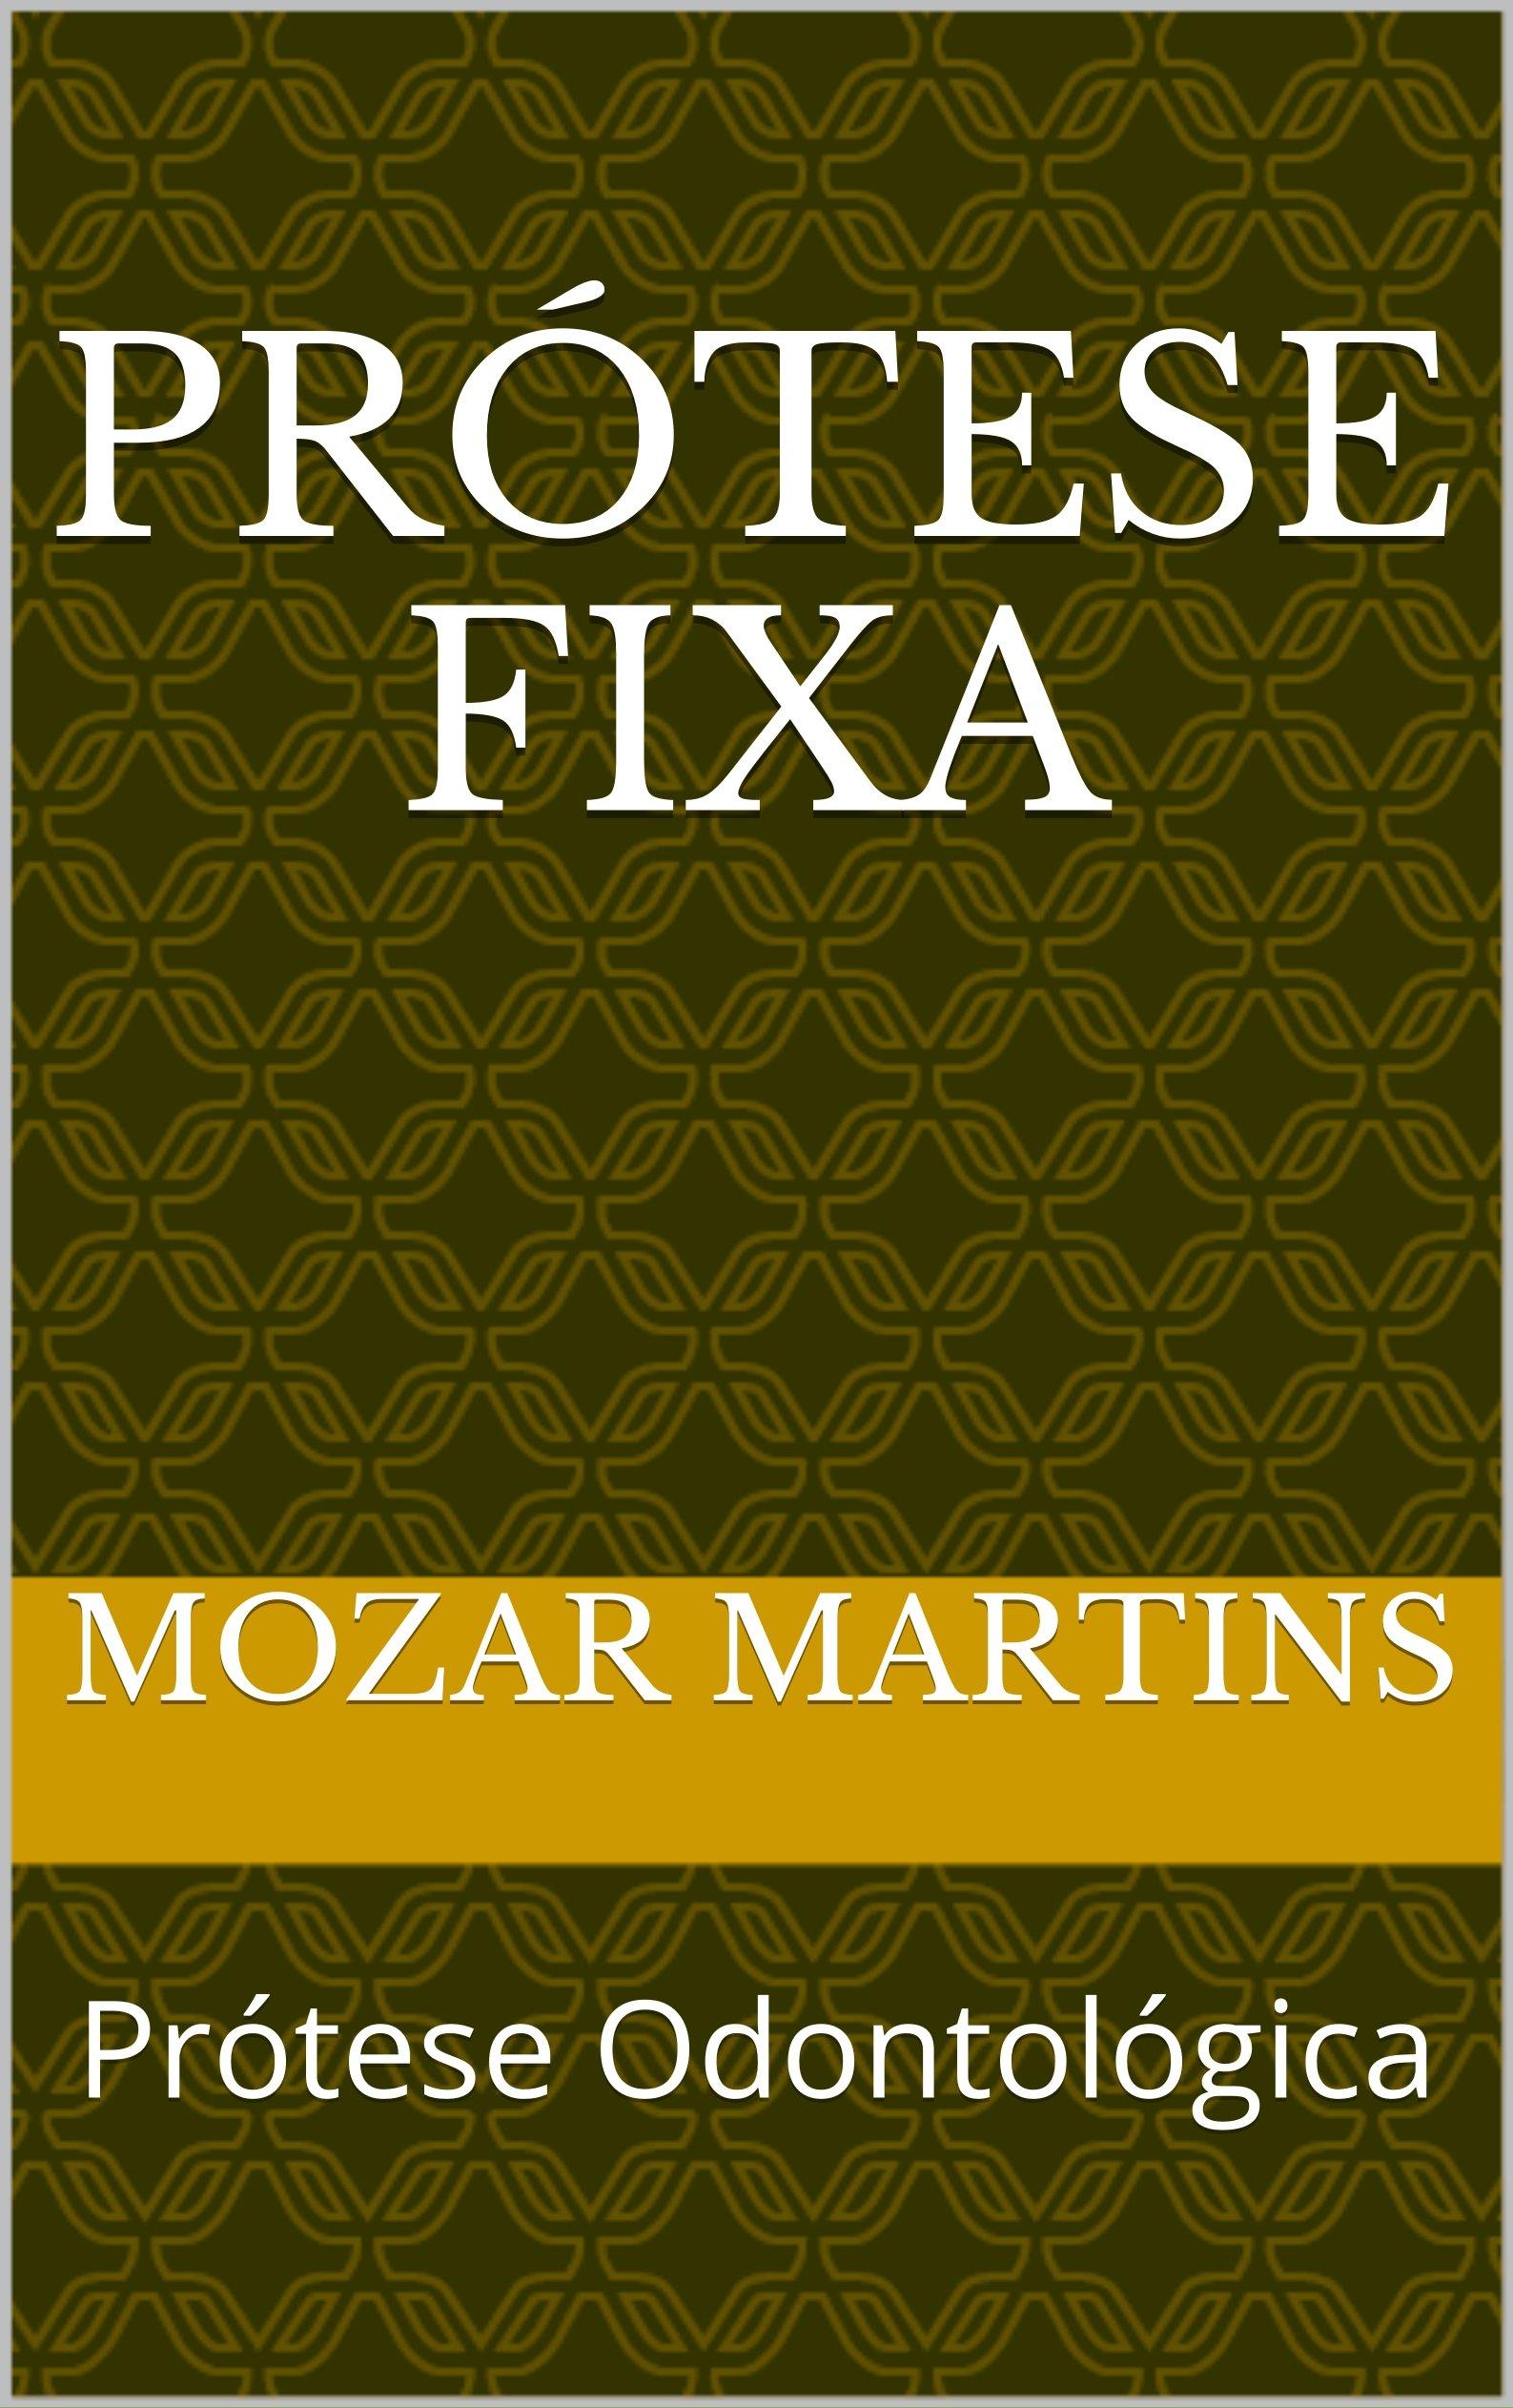 Prótese Fixa  Prótese Odontológica  Portuguese Edition